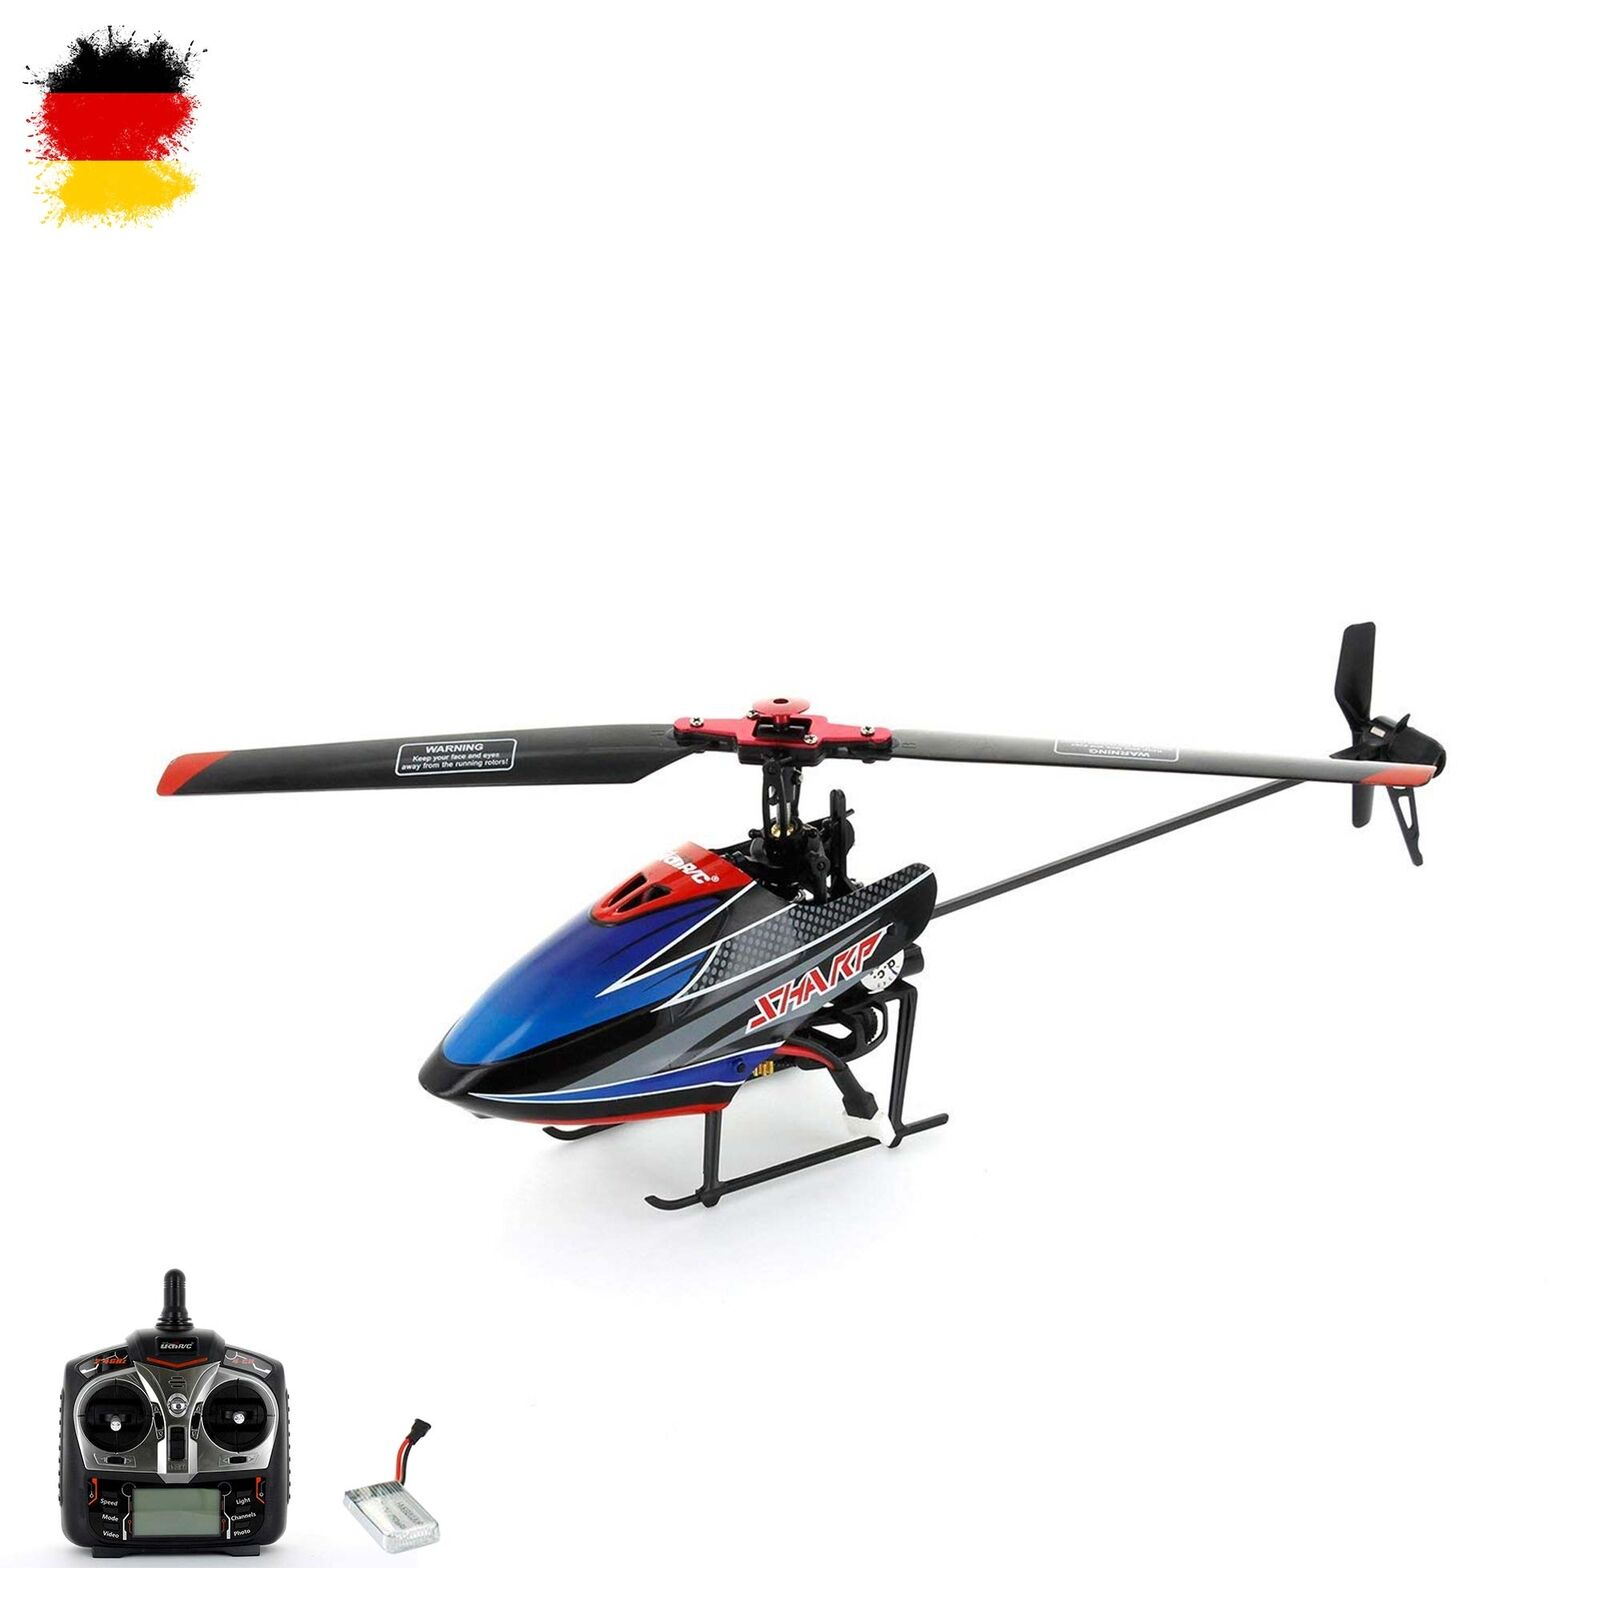 RC ferngesteuerter Flybarless-Hubschrauber 4.5 Kanal Helikopter-Modell